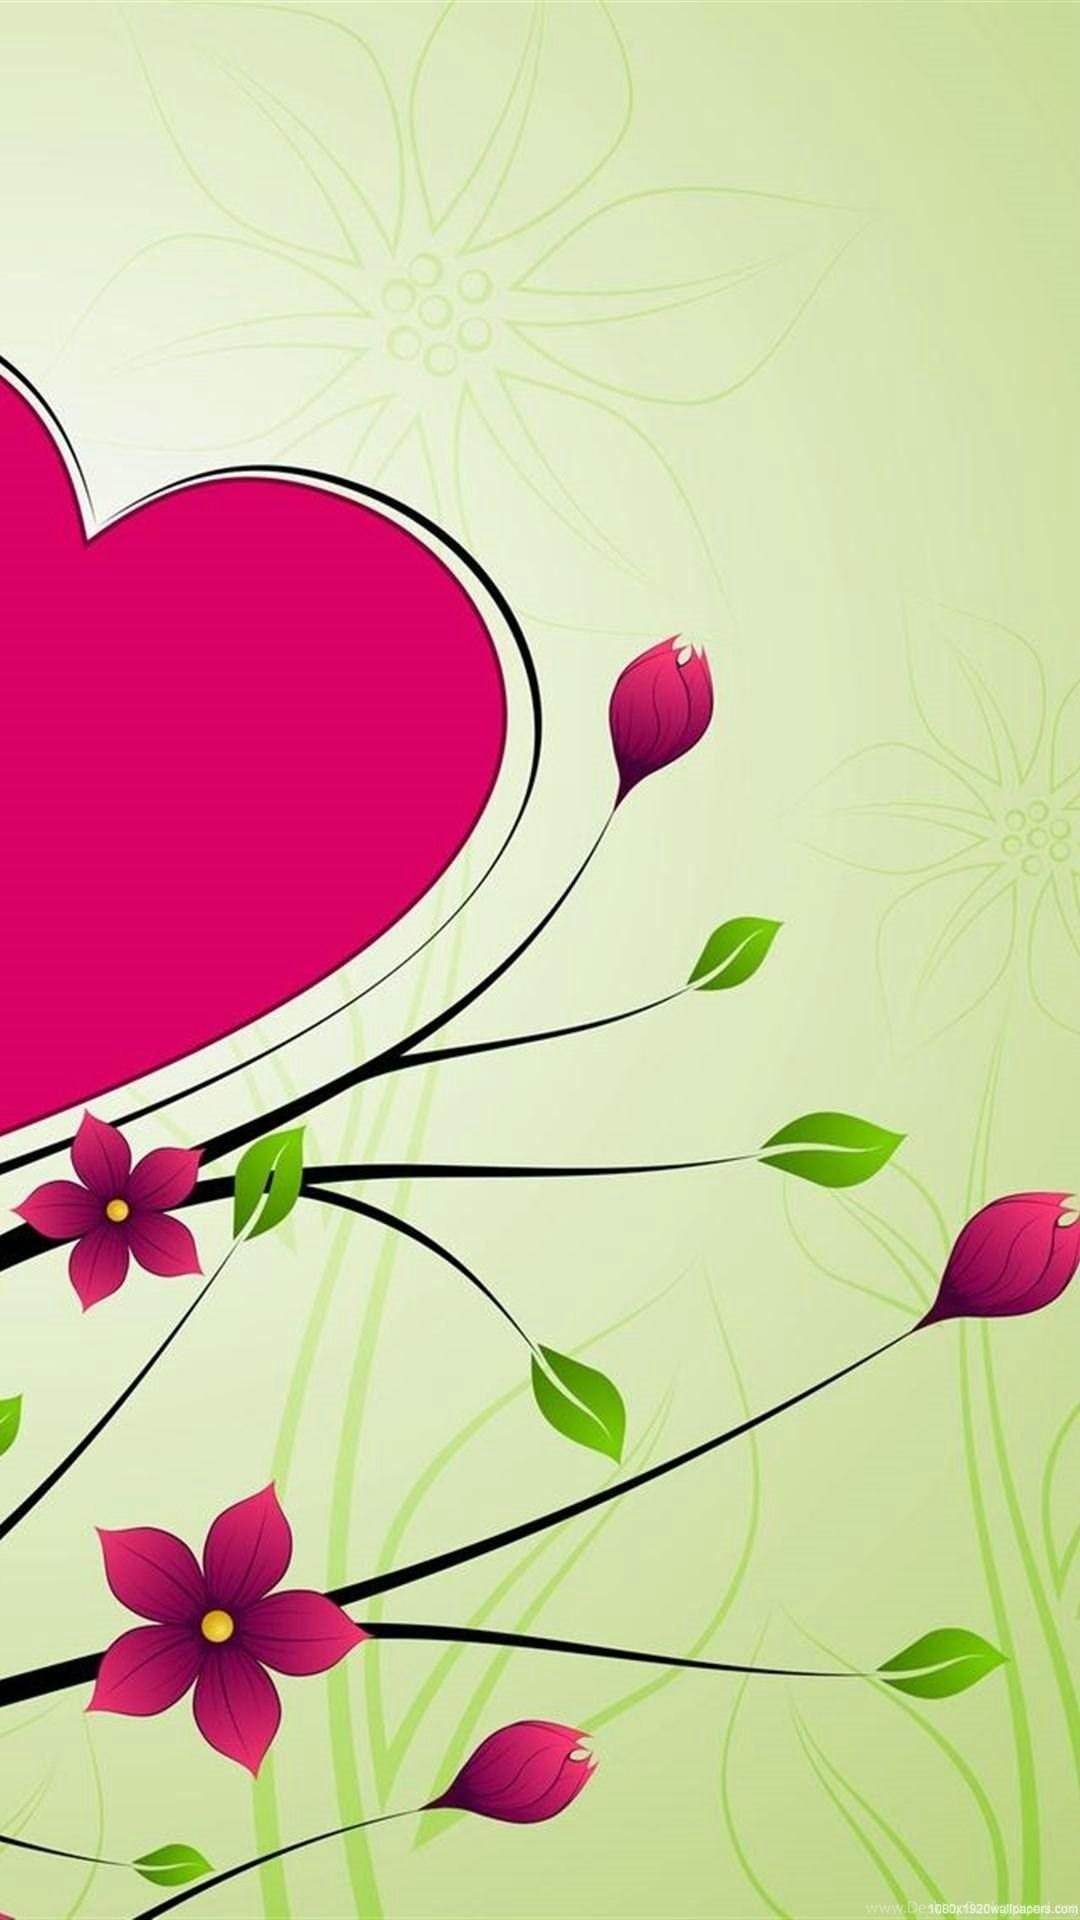 1080x1920 Rose Love Heart Flowers Design Wallpapers Hd Desktop